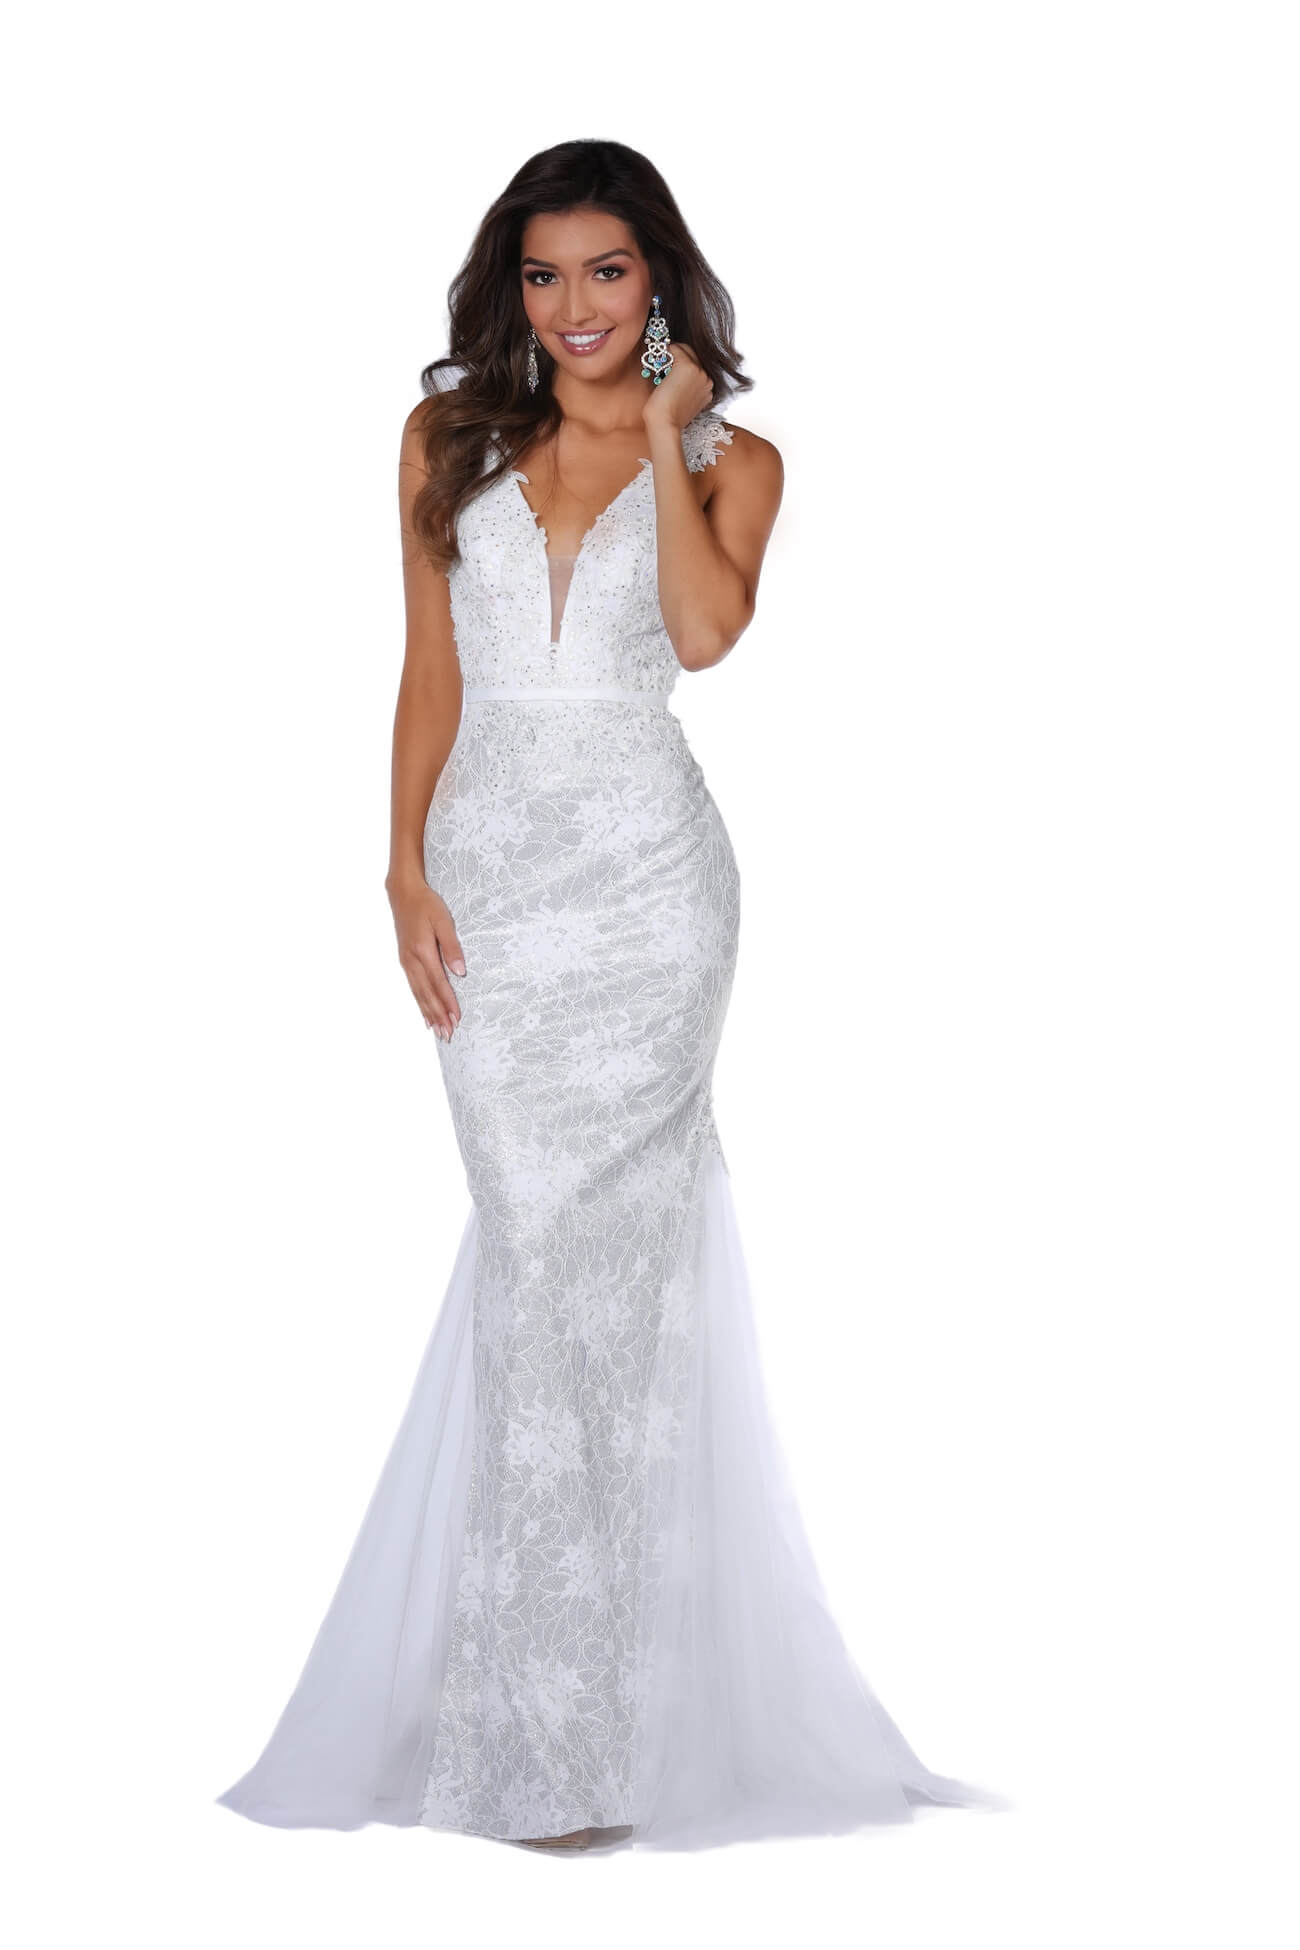 Queenly size 6 Vienna White Mermaid evening gown/formal dress